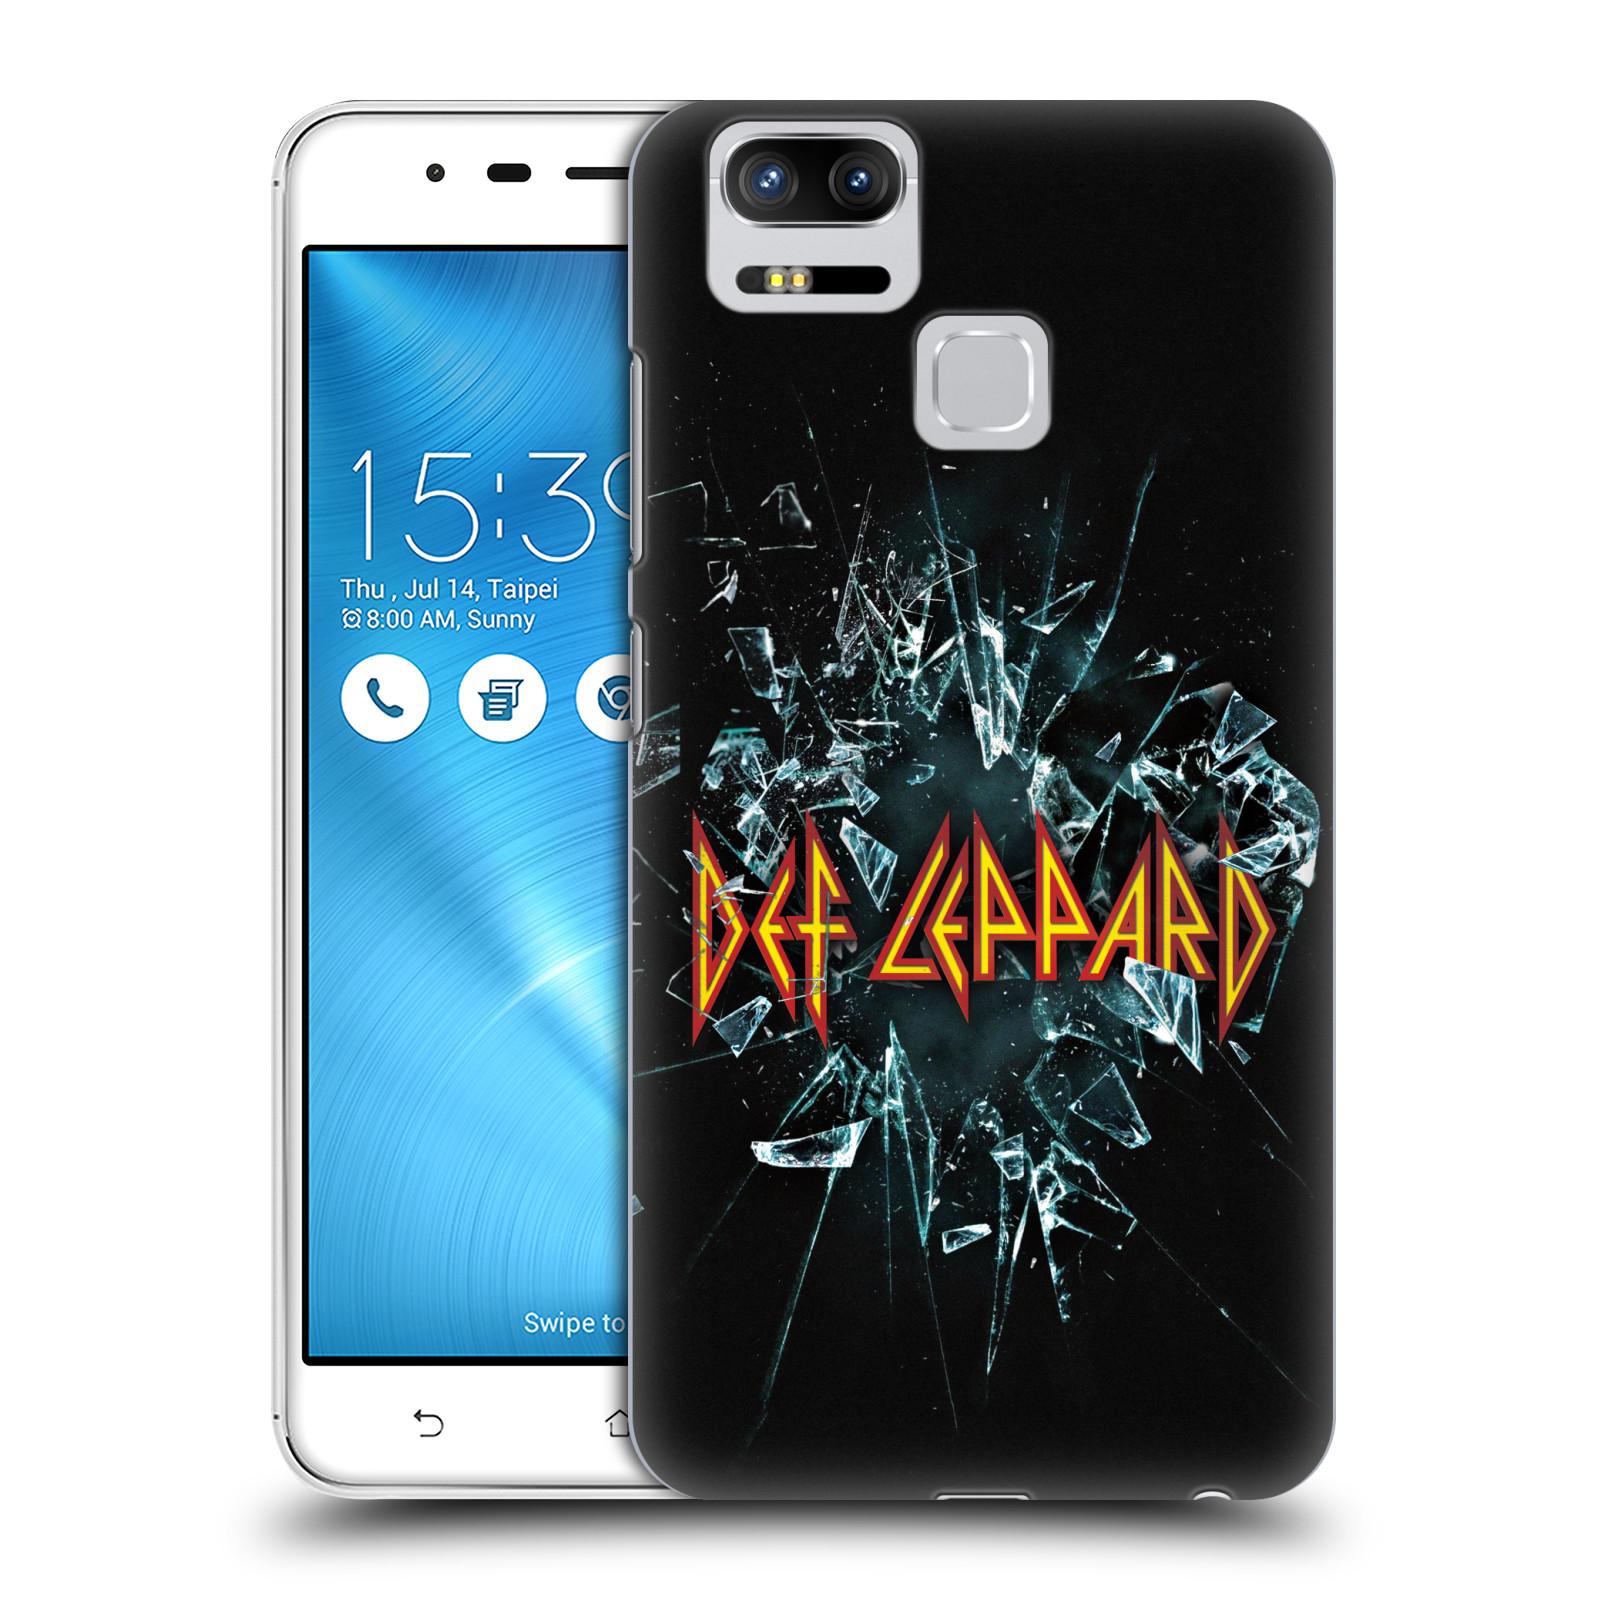 Oficial-Def-Leppard-albumes-funda-rigida-posterior-para-Asus-ZenFone-telefonos